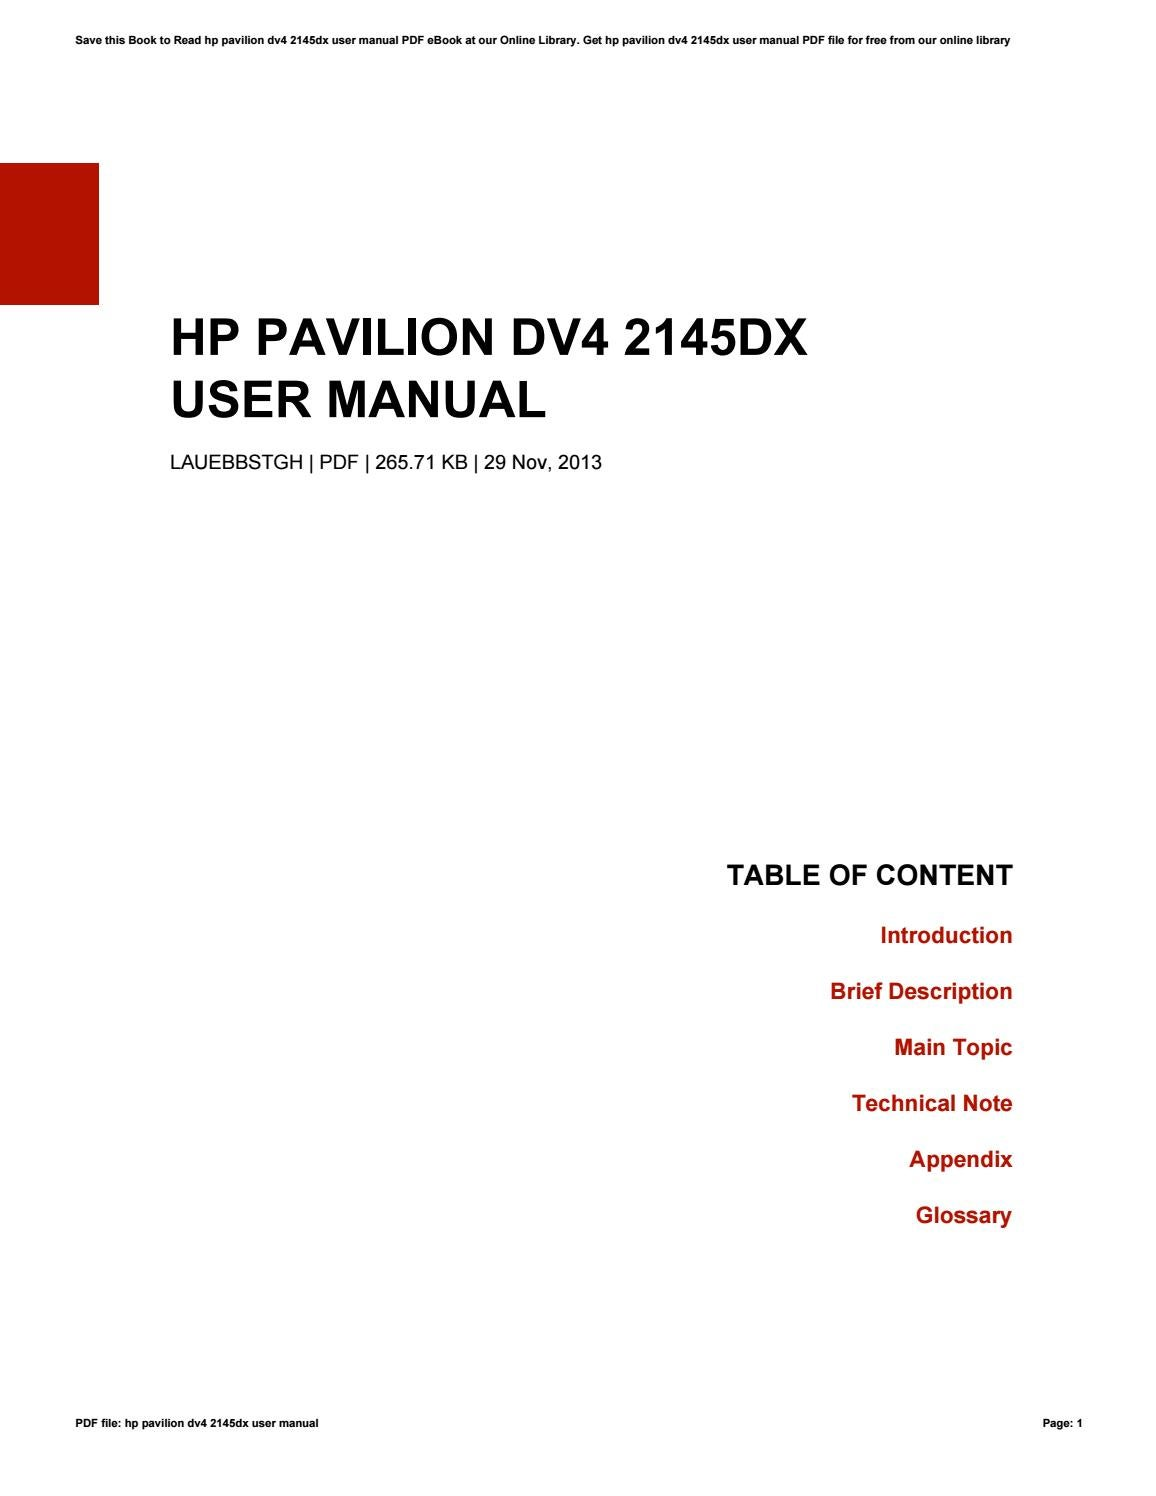 hp pavilion dv4 drivers for windows 7 64 bit